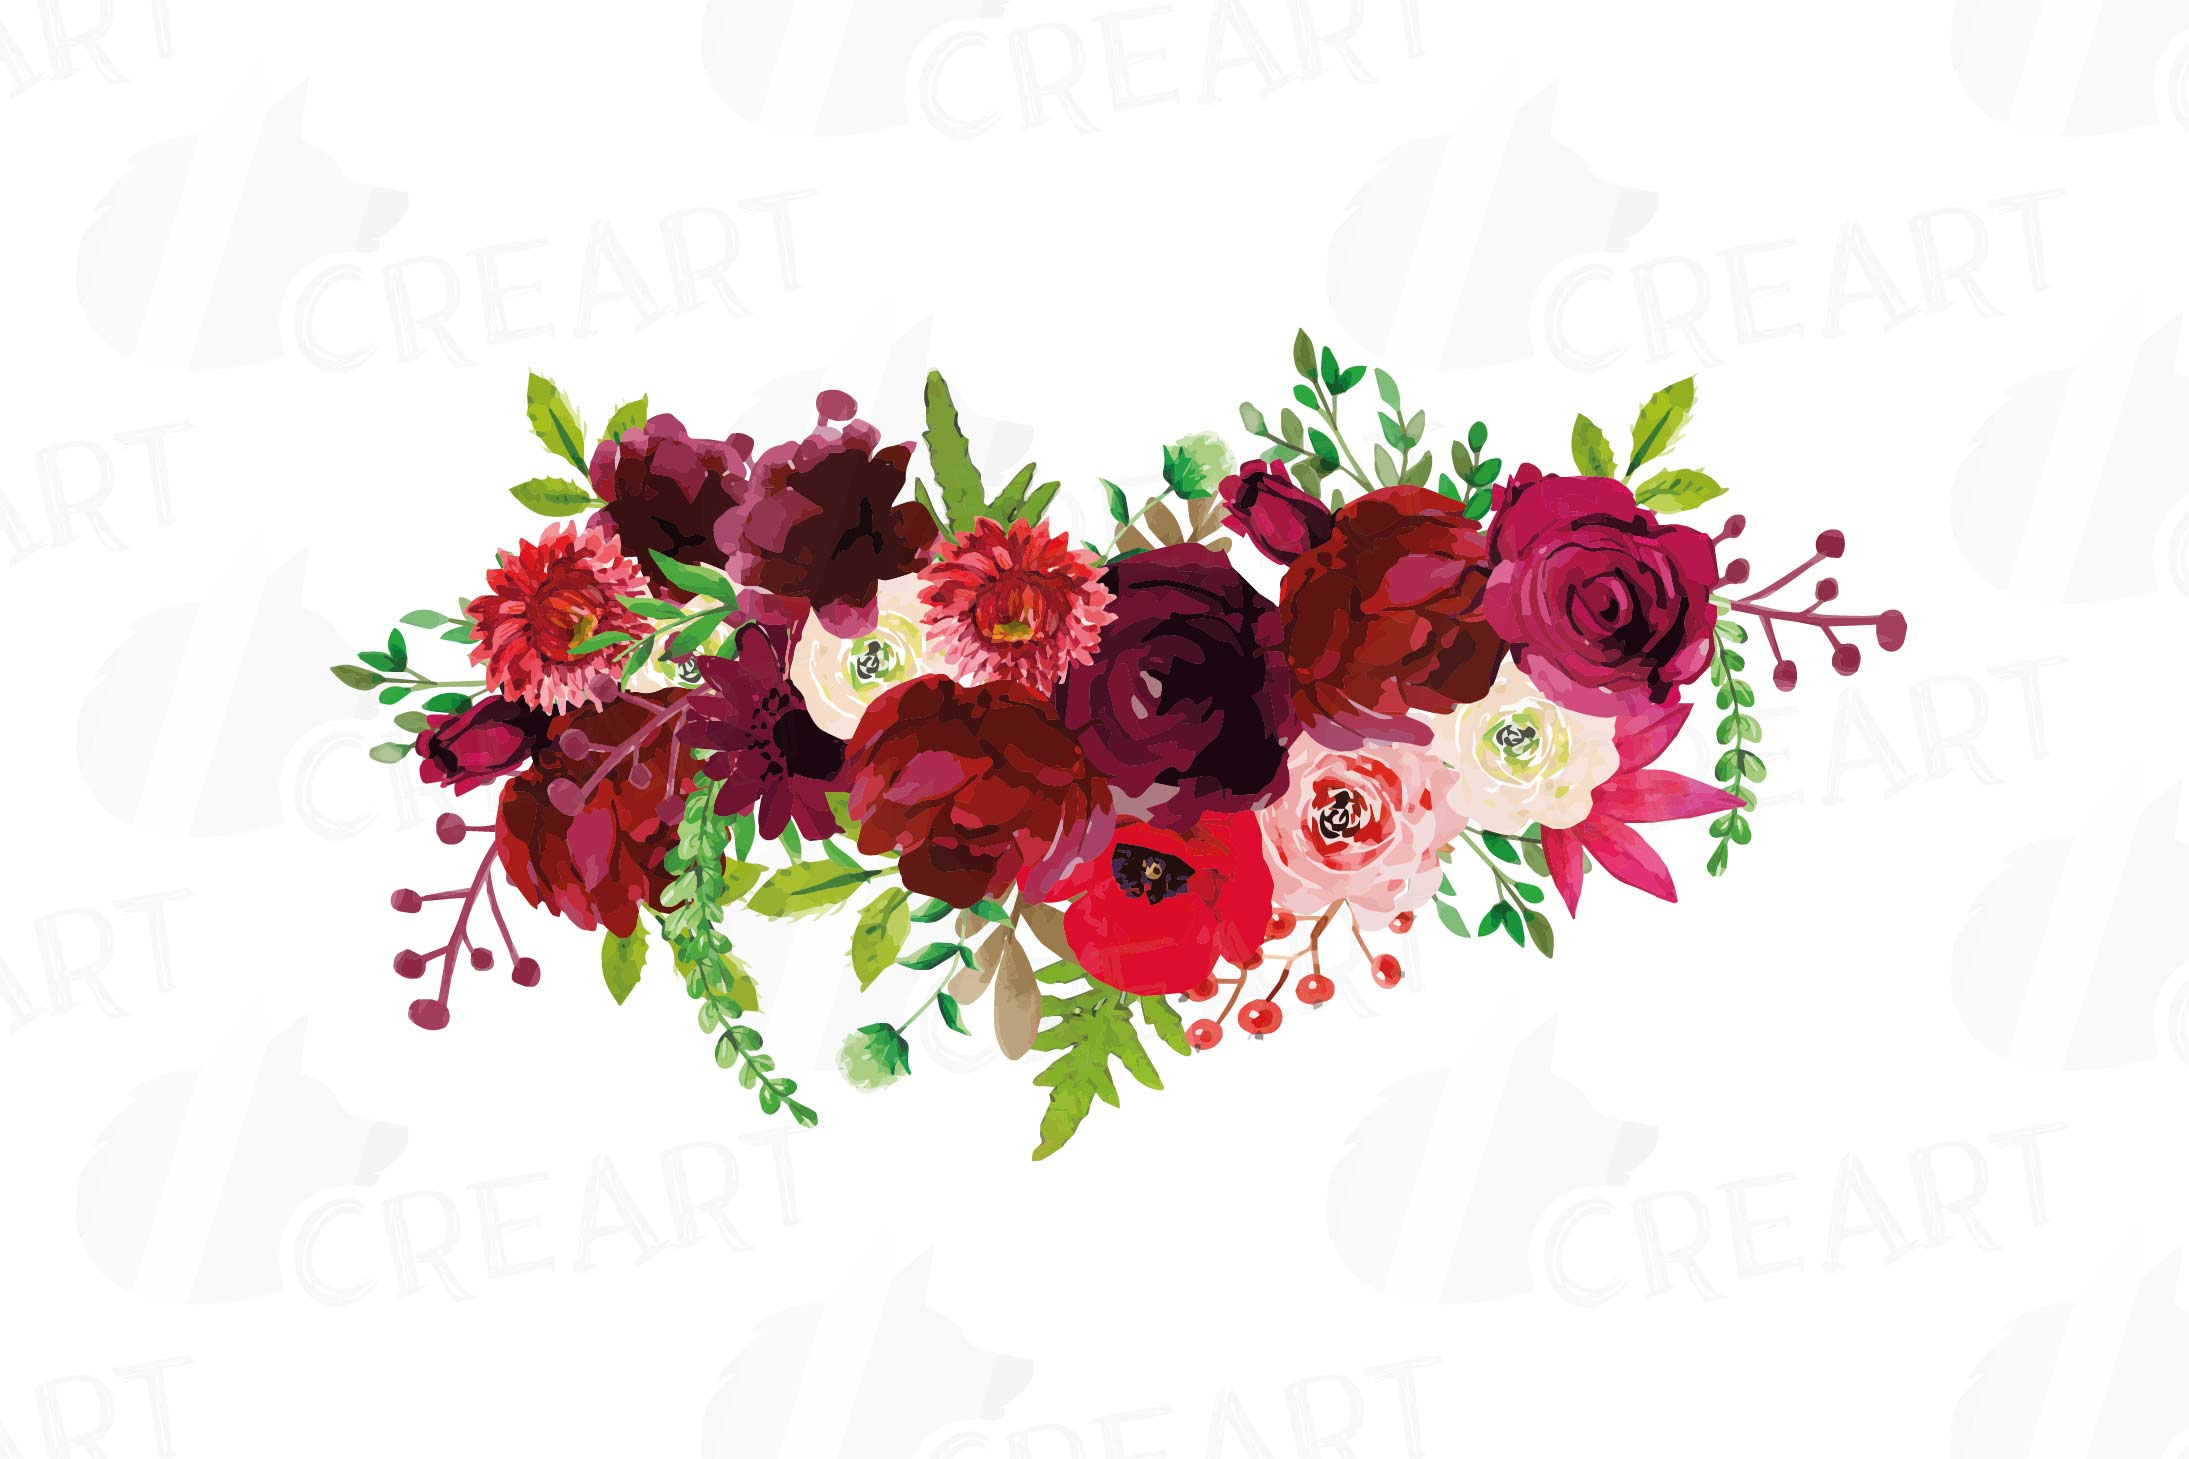 Boho flower bouquet clipart image freeuse stock Boho Burgundy Red Watercolor clip art, floral bouquets png image freeuse stock